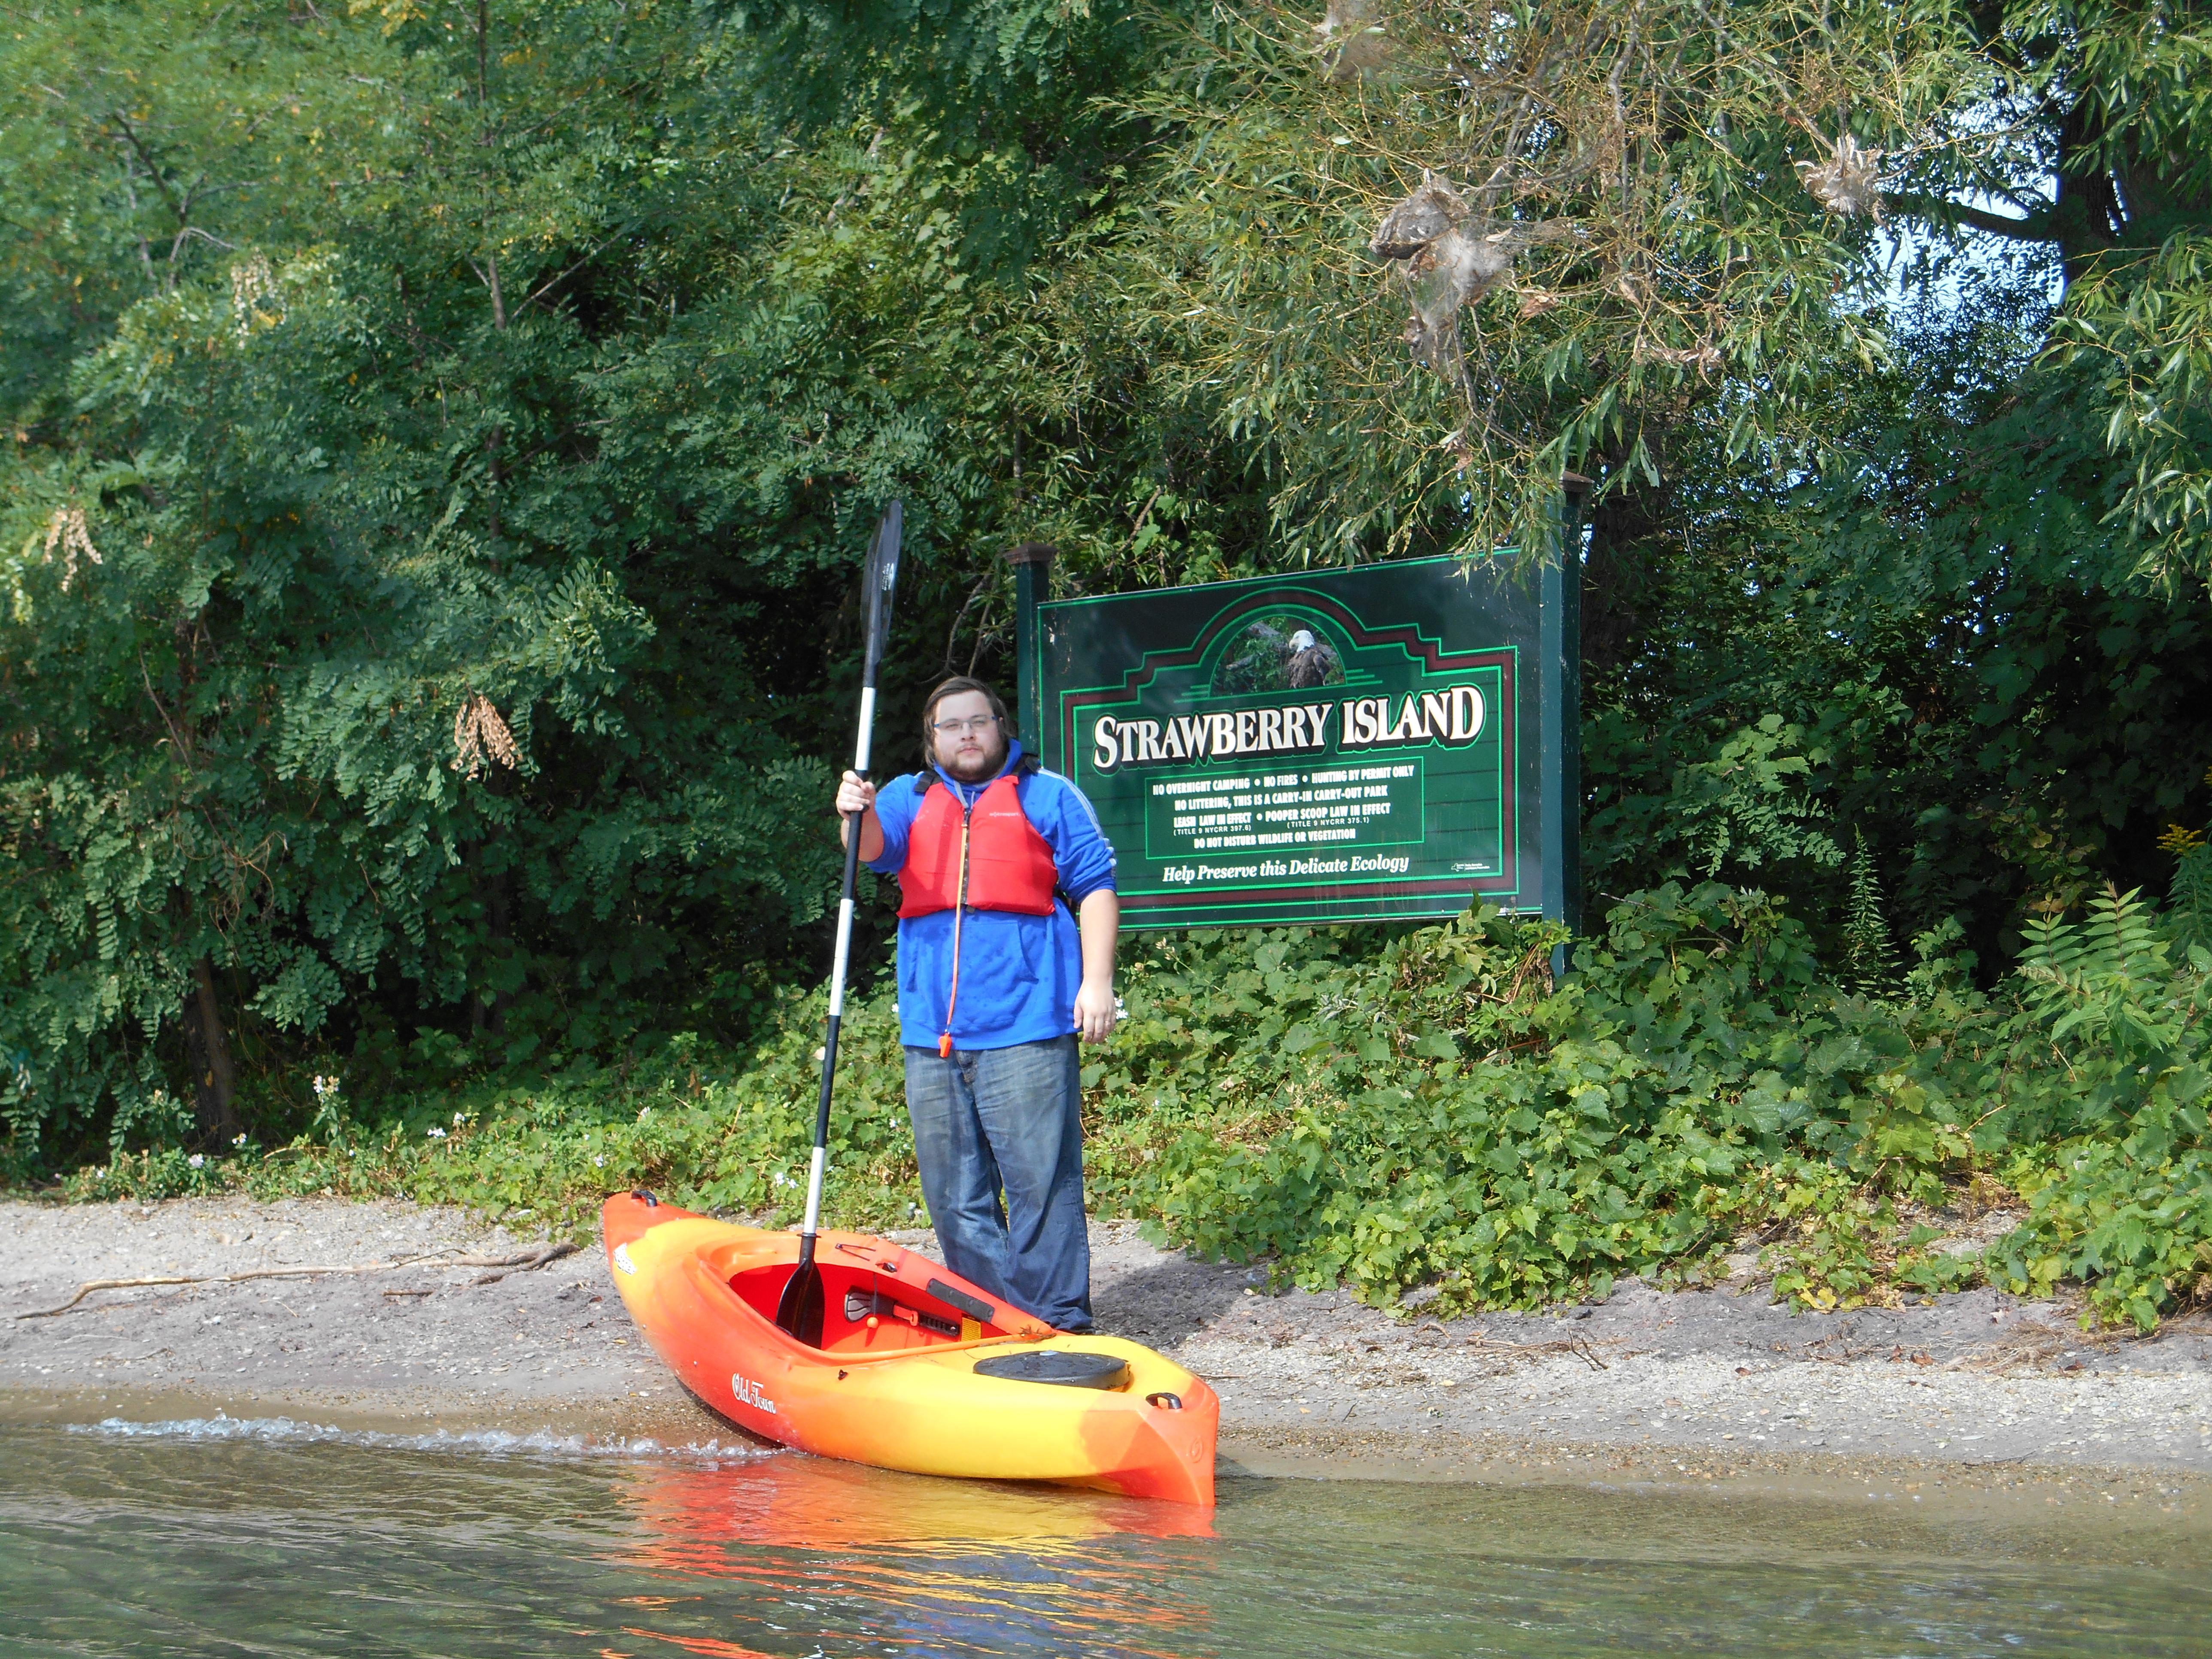 DSCN1520 – Buffalo Geological Society Inc